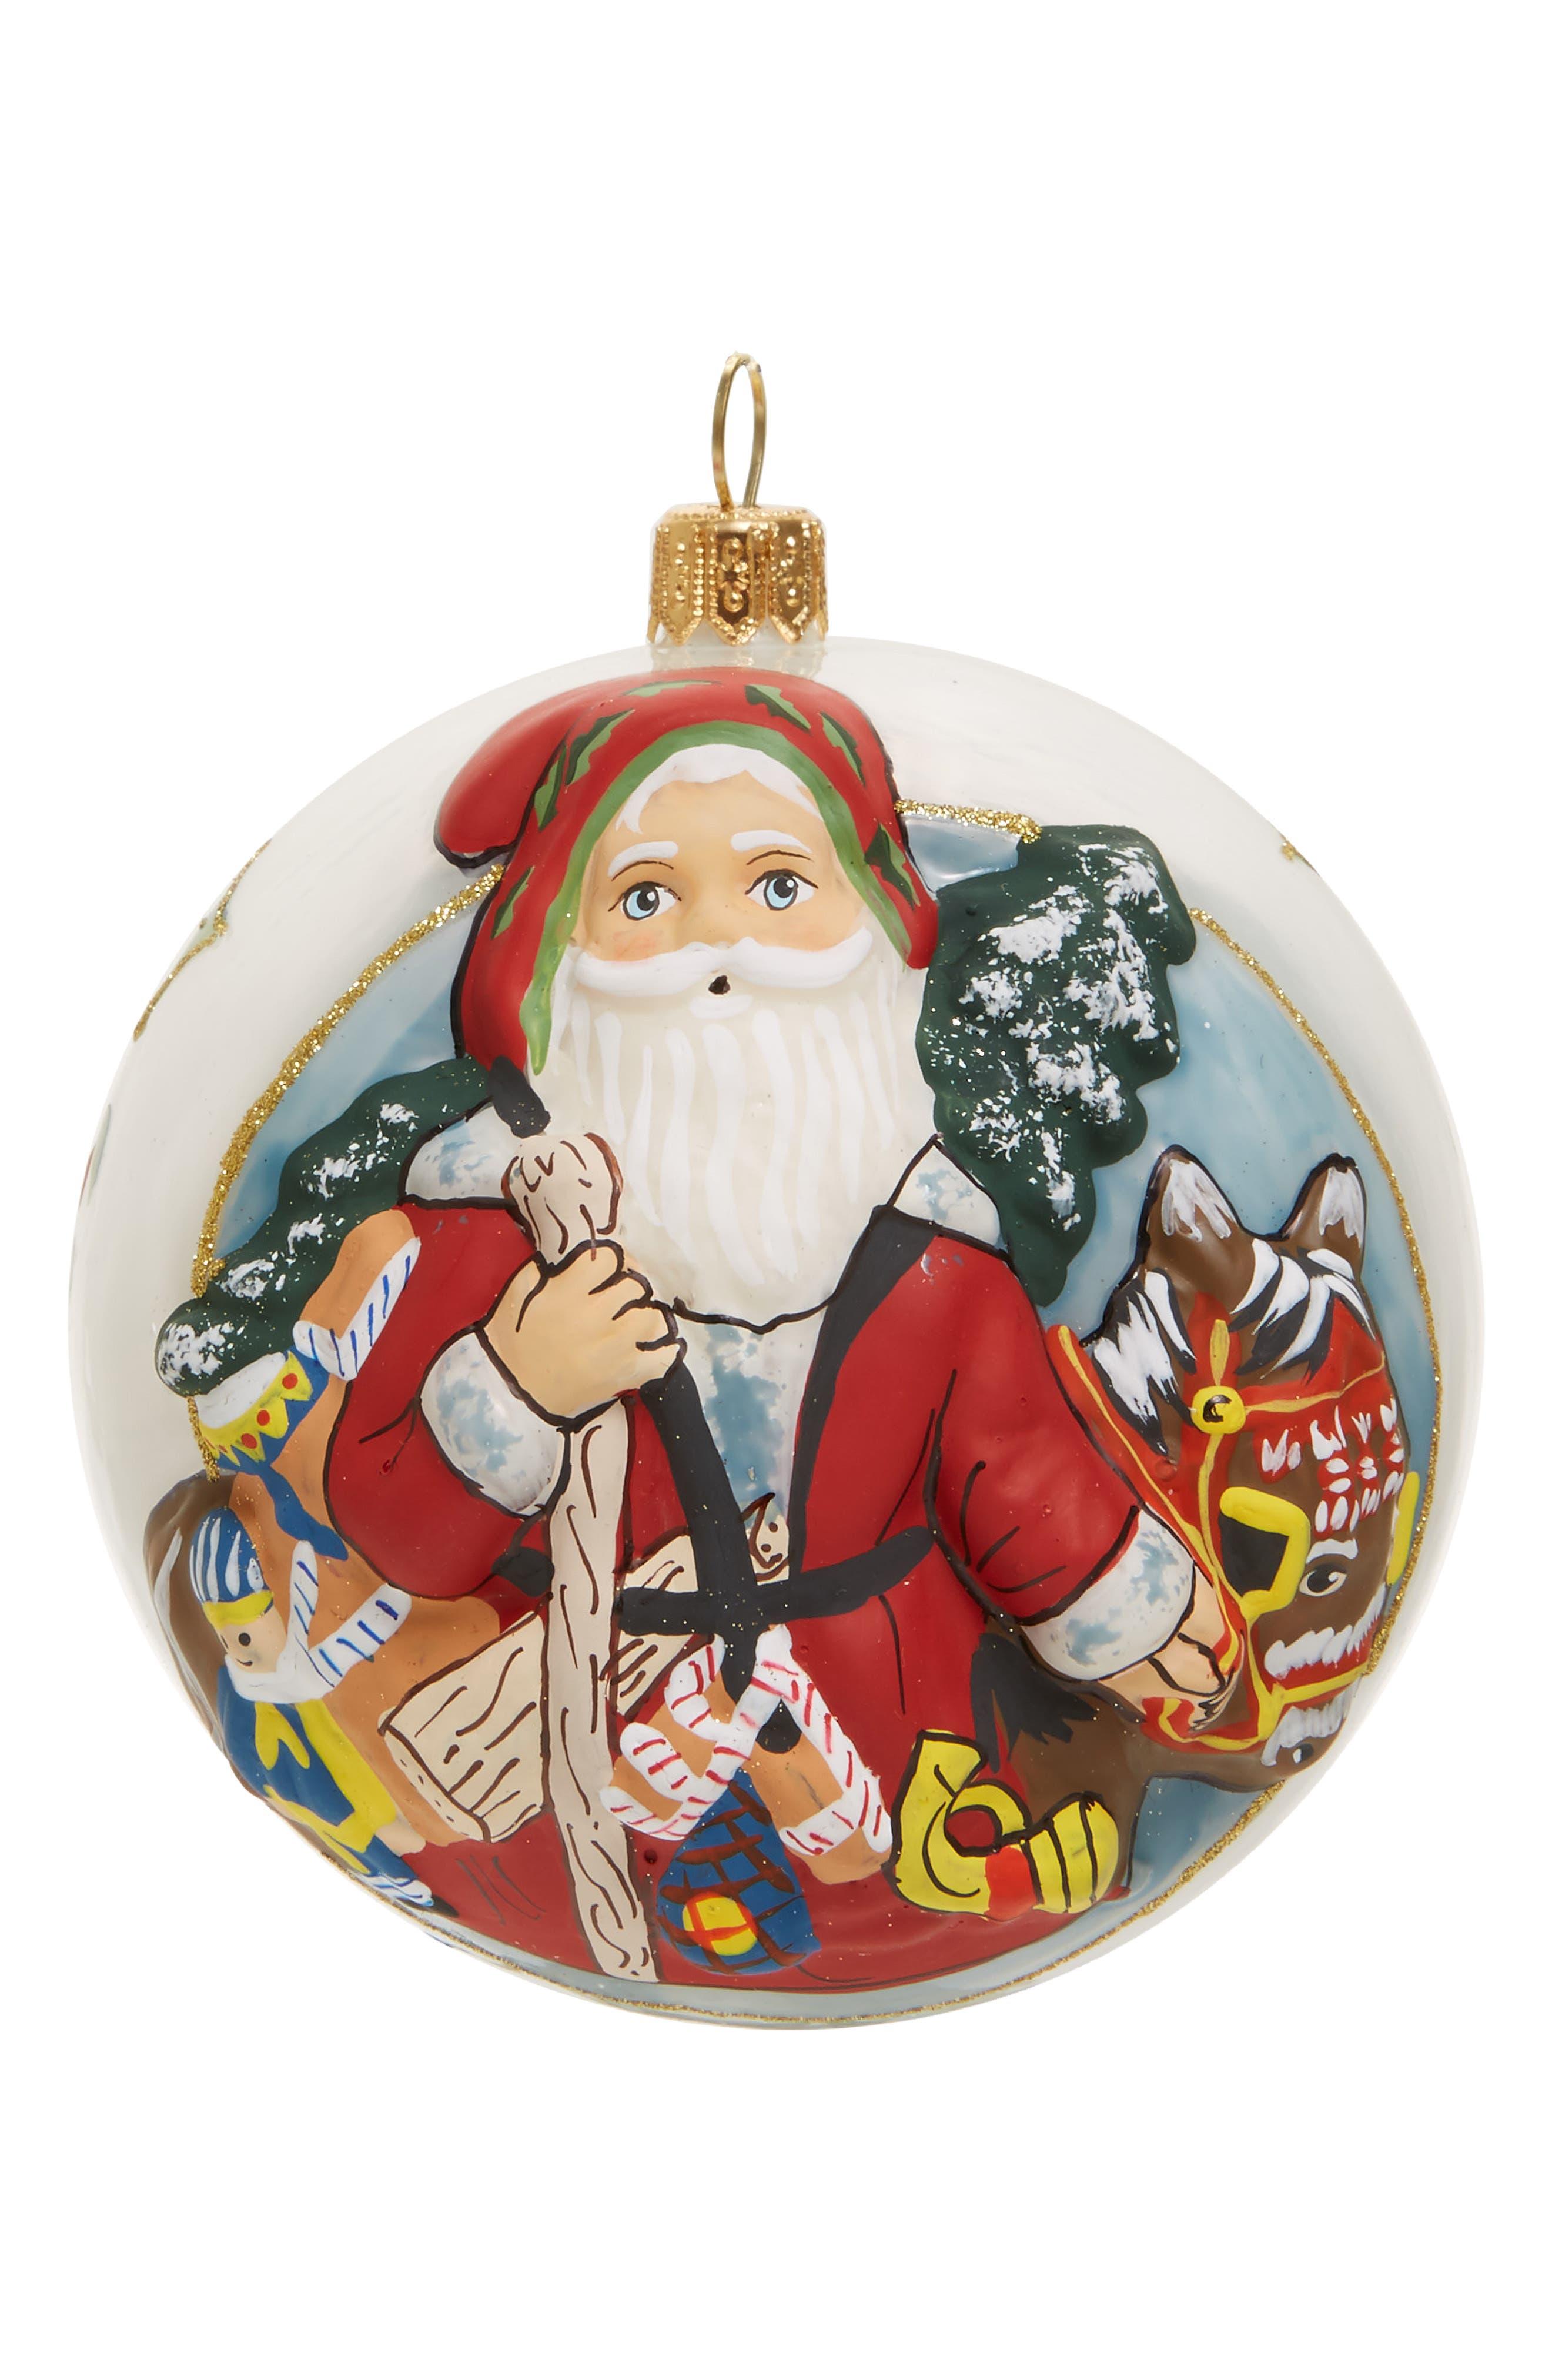 Main Image - Vaillancourt Jingle Ball Santa Glass Ornament